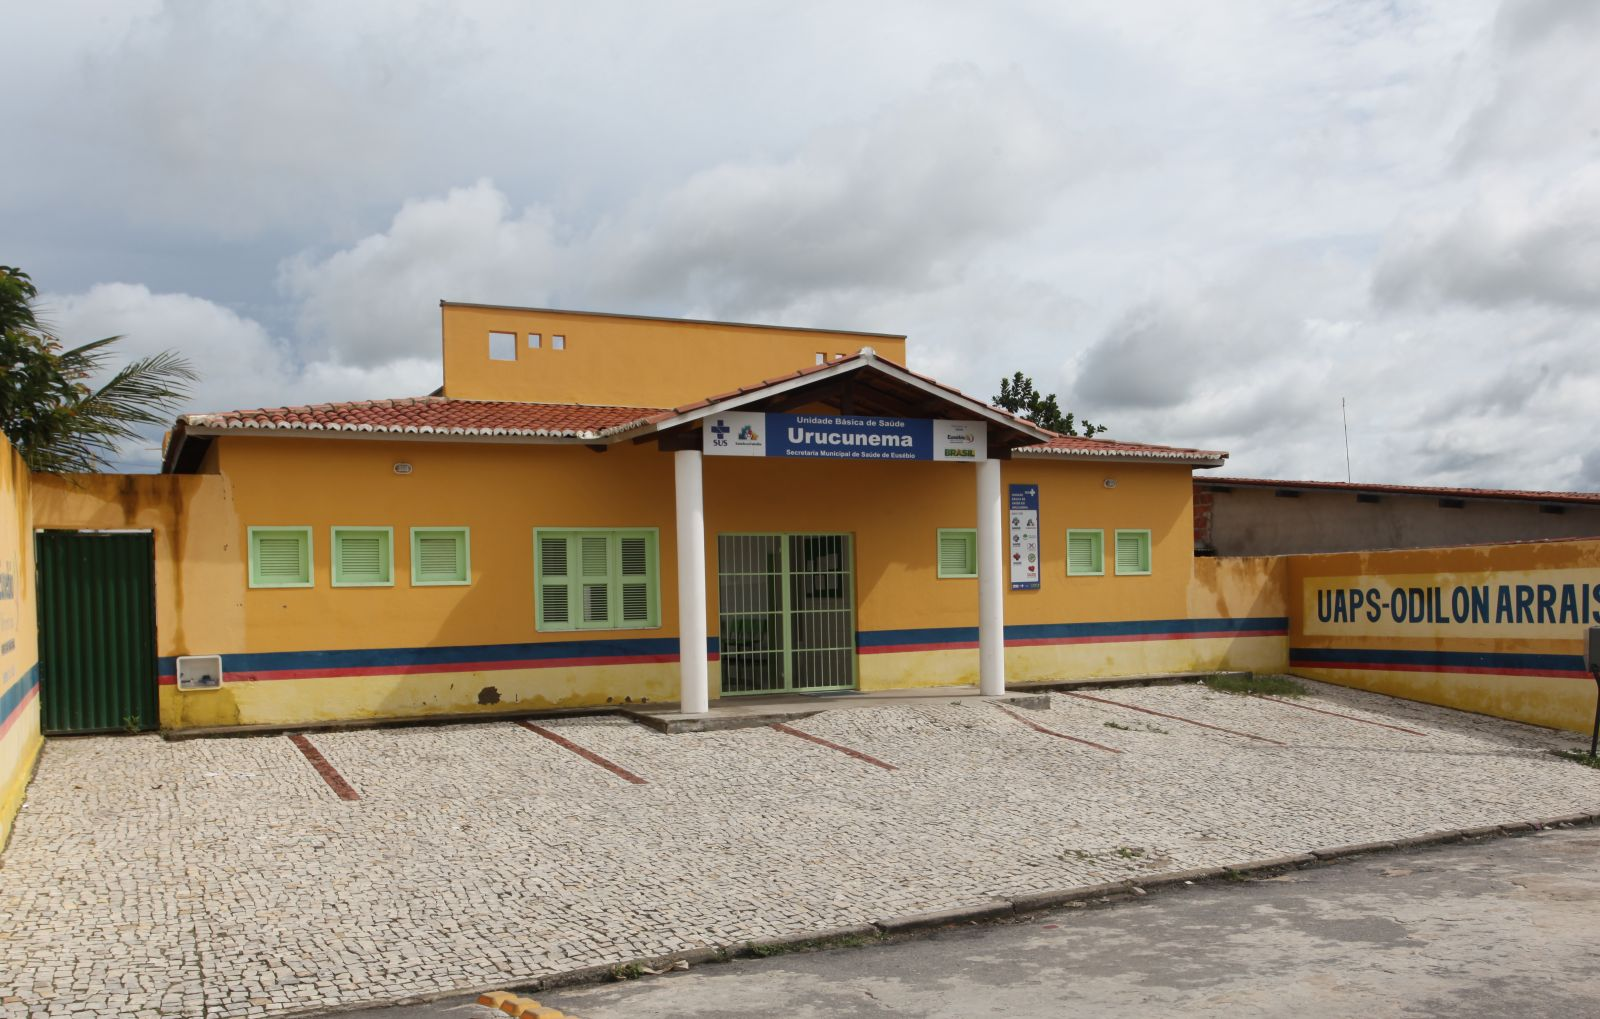 Prefeitura de Eusébio inaugura nesta quinta a Unidade Primária de Saúde do Urucunema